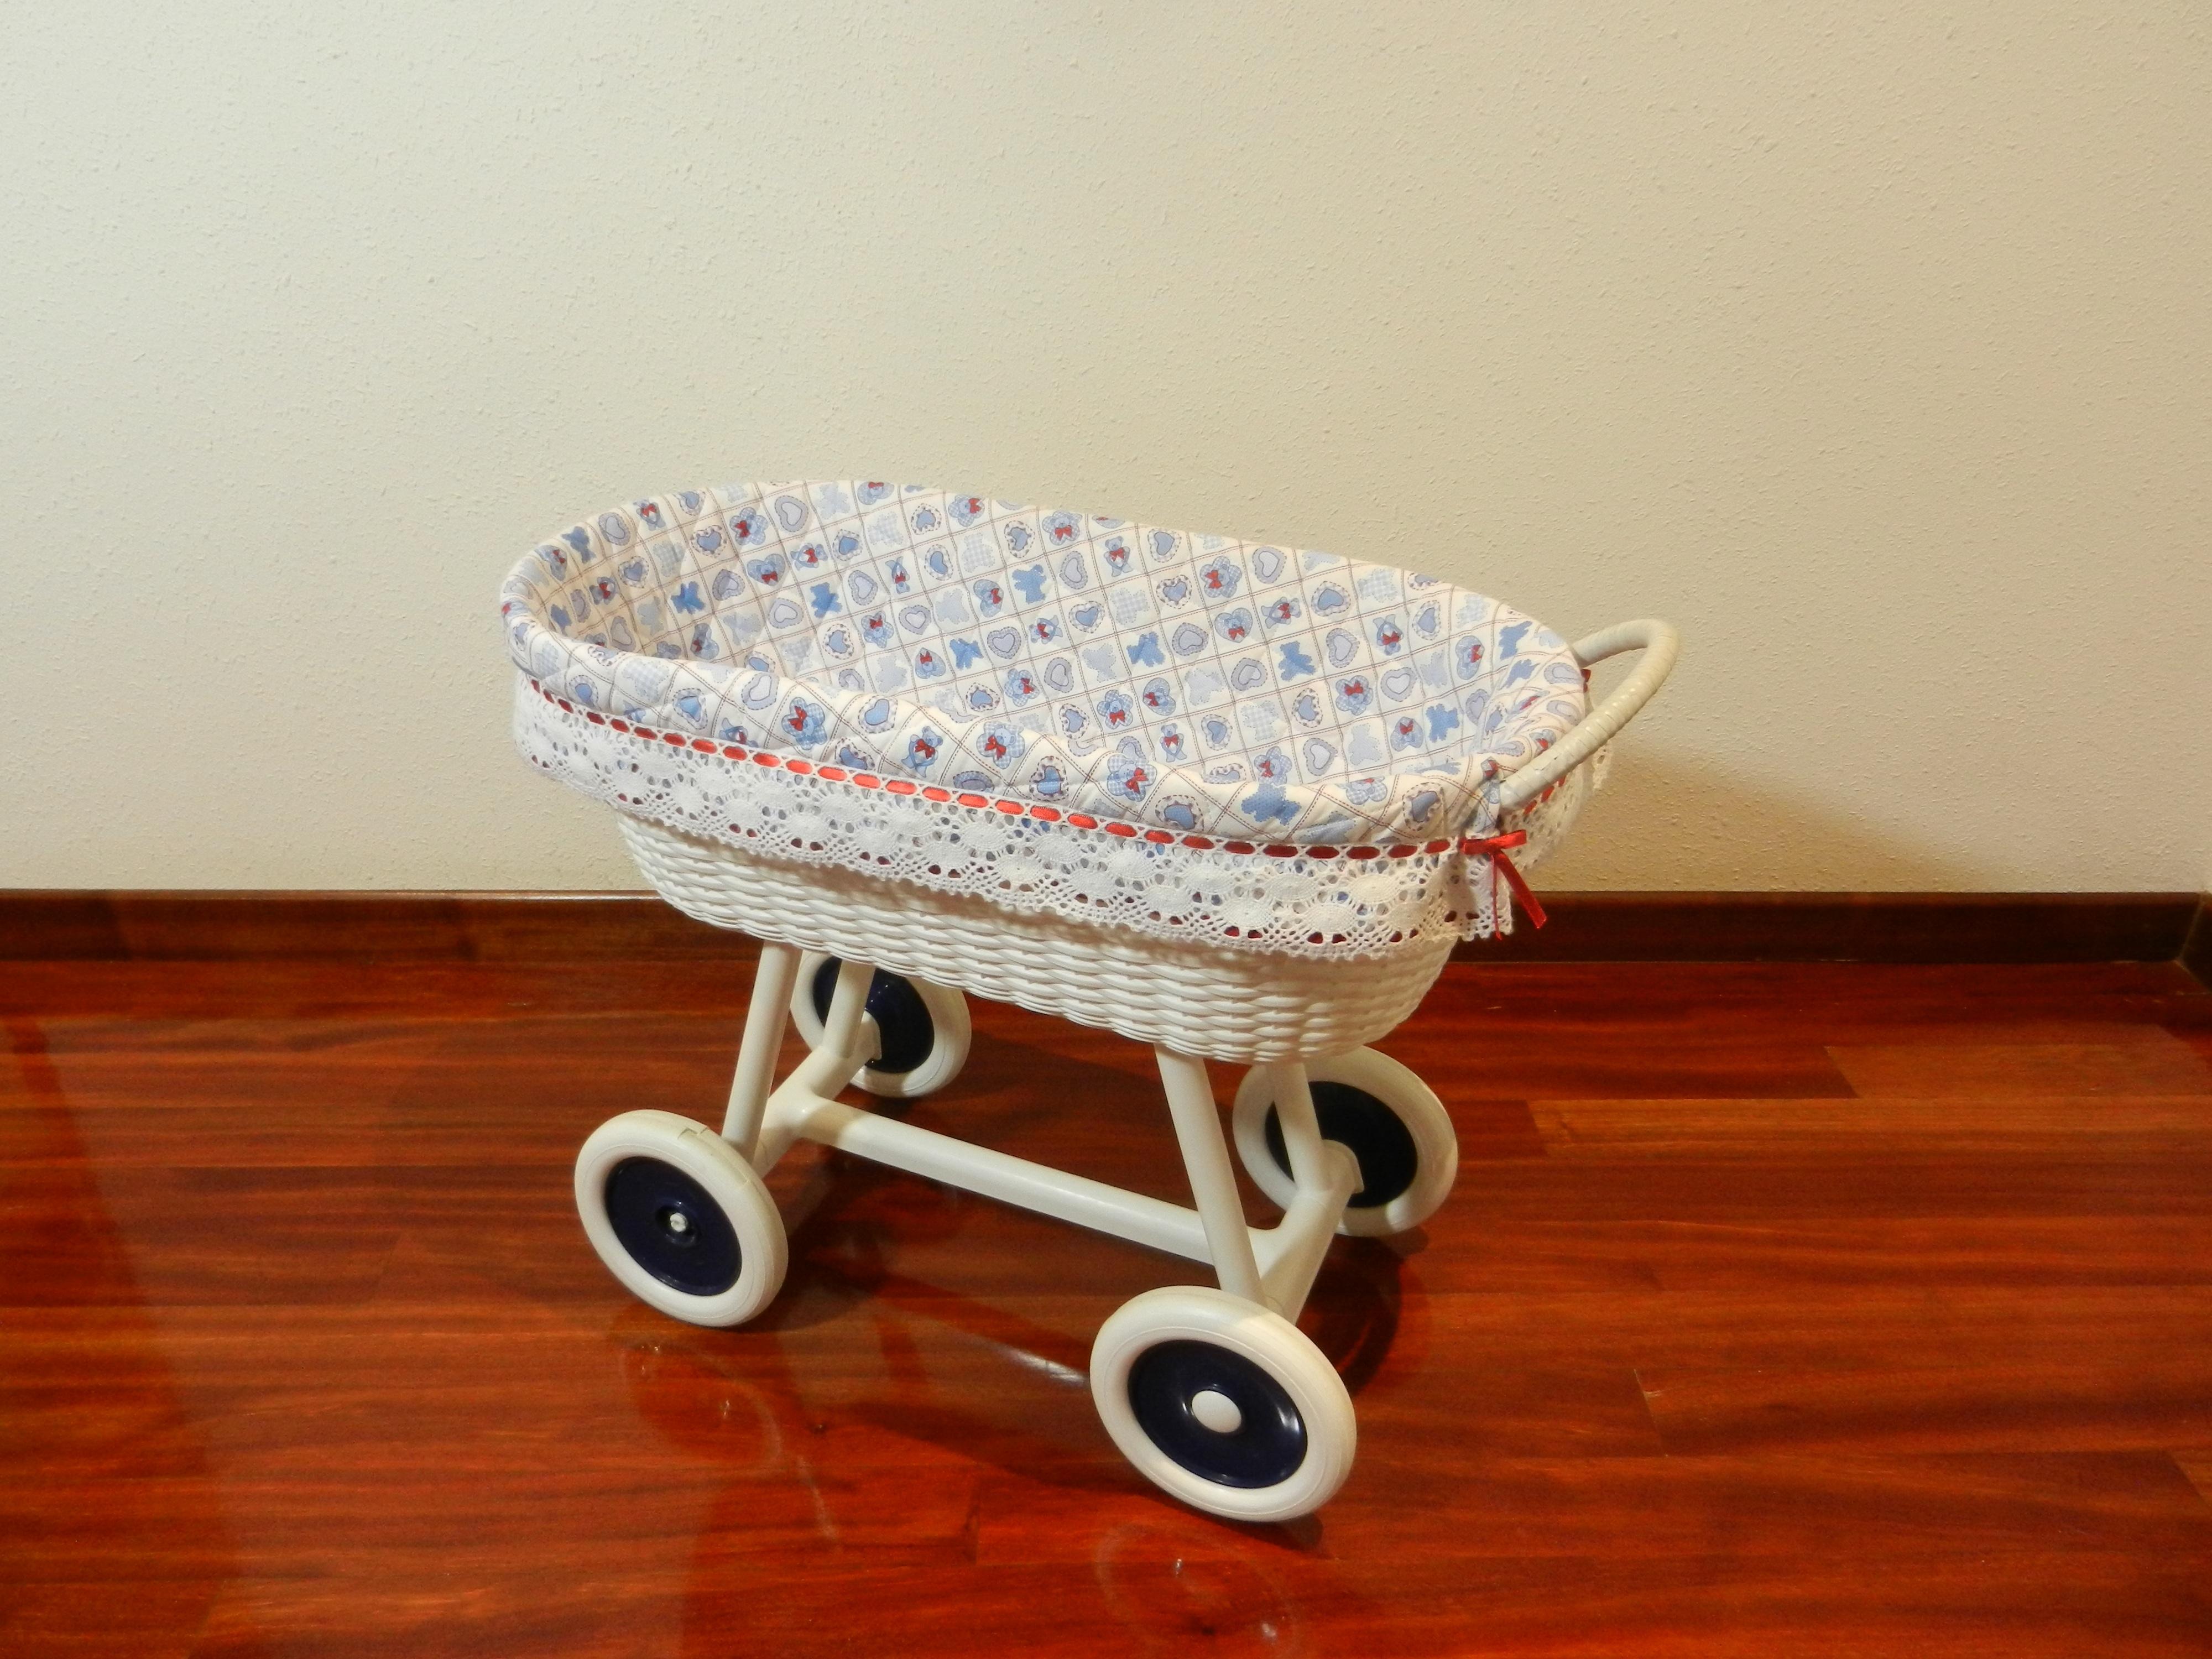 mesa carro silla vehculo mueble juguete producto cama cochecito de beb moiss carro de la mueca